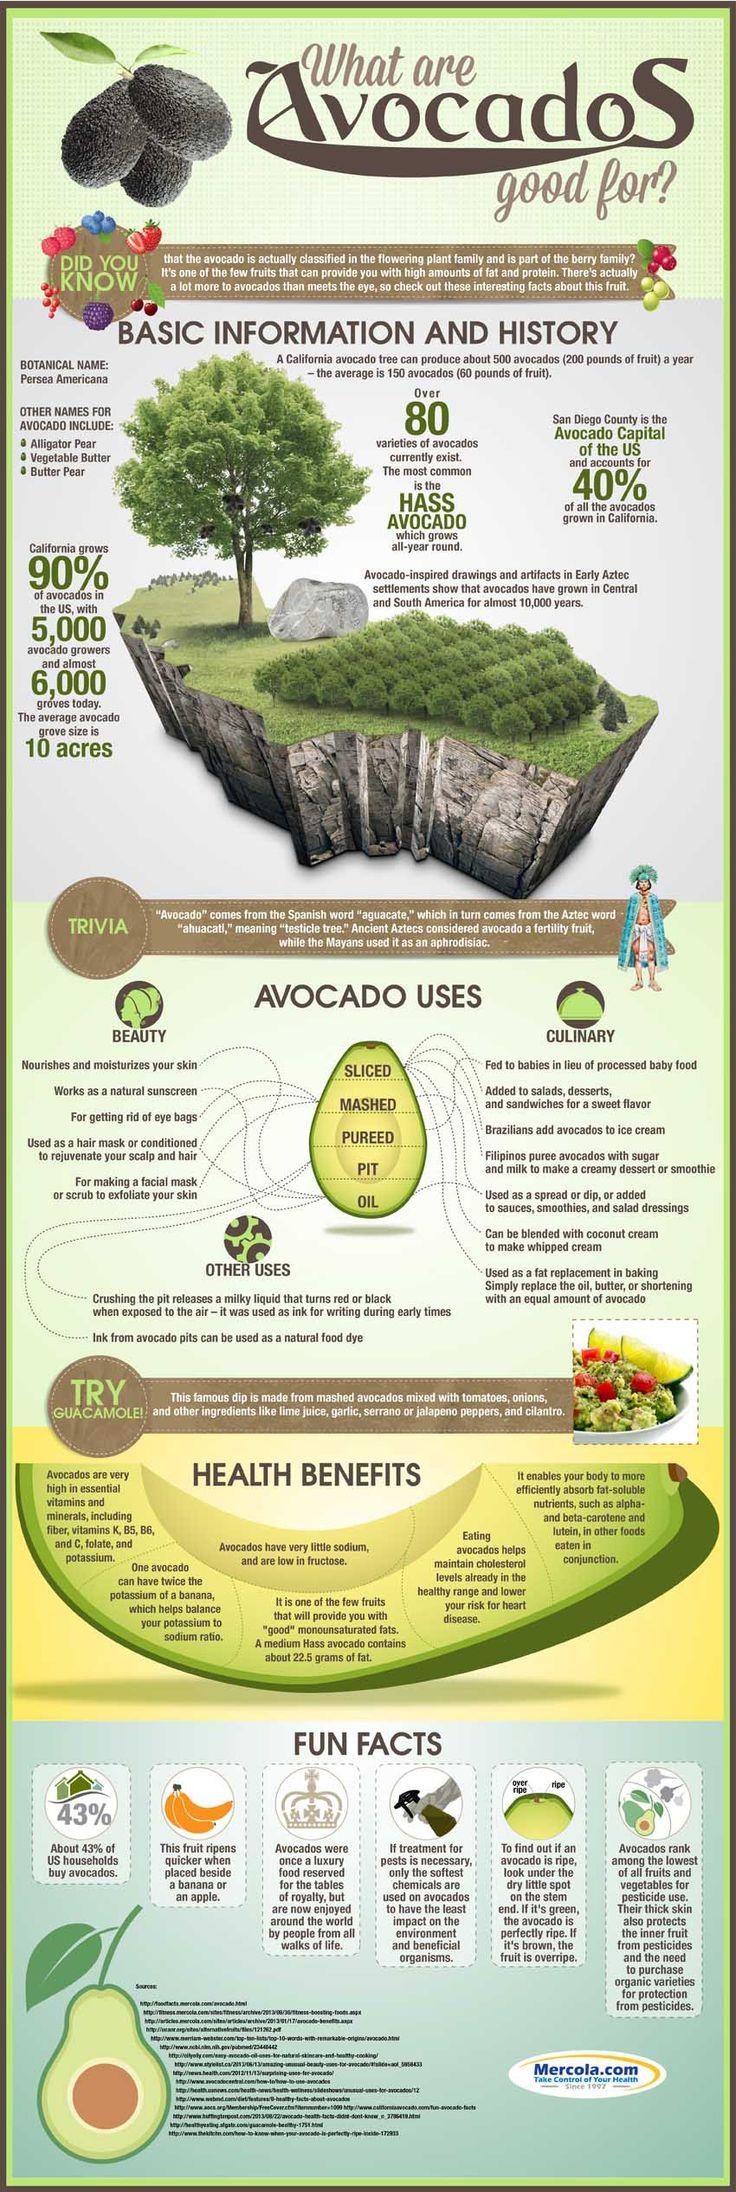 Avocado Uses and Health Benefits Infographic